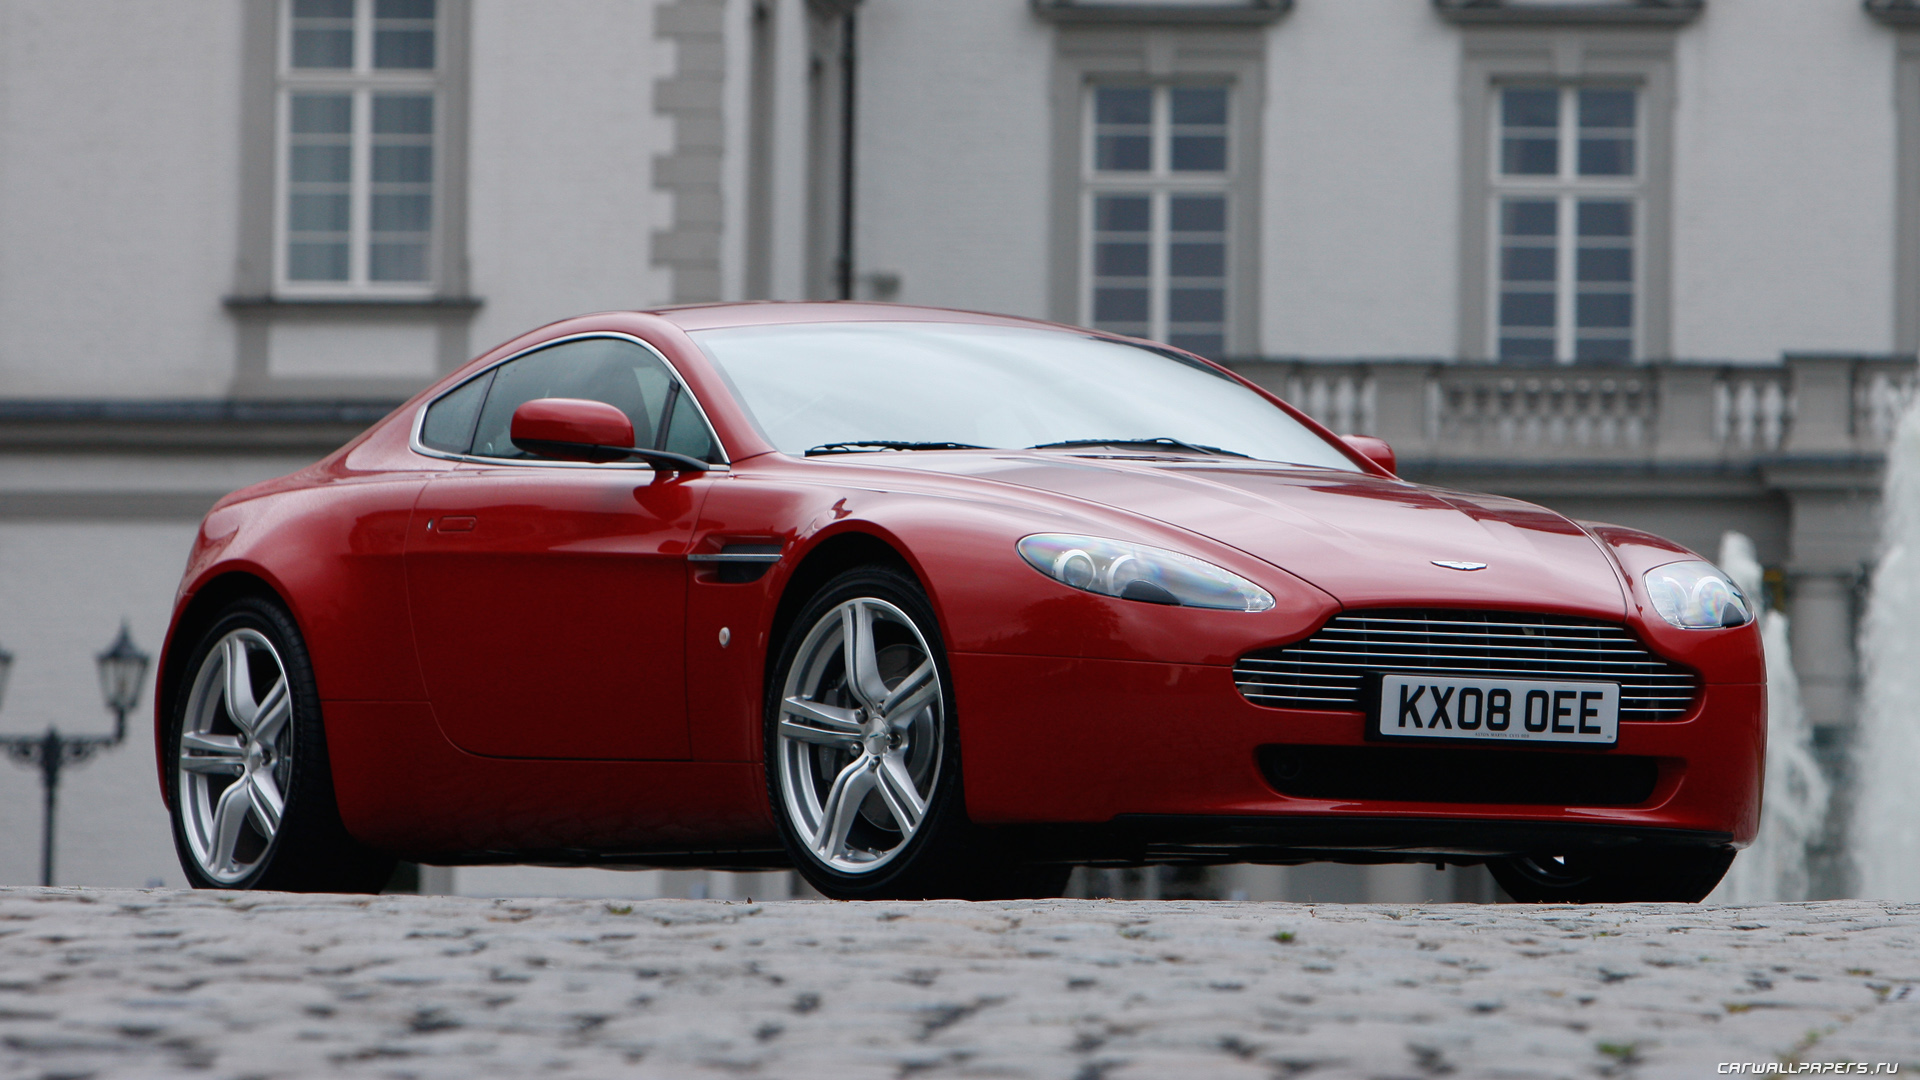 Cars Desktop Wallpapers Aston Martin V8 Vantage Fire Red 2008